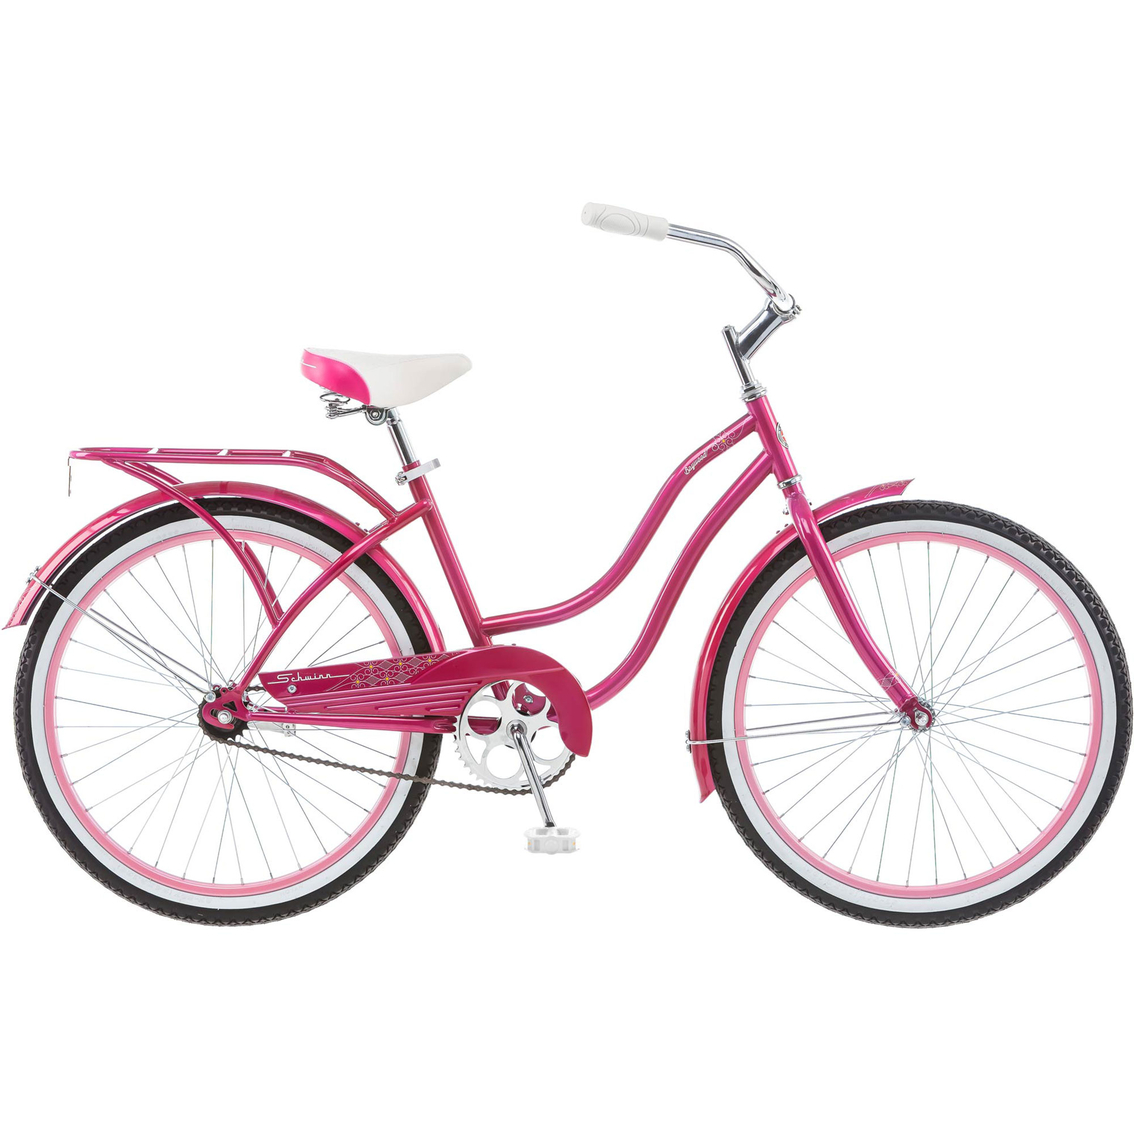 2963e37b3b2 Schwinn Girls Baywood 24 In. Cruiser Bicycle | Kids' Bikes | Sports ...